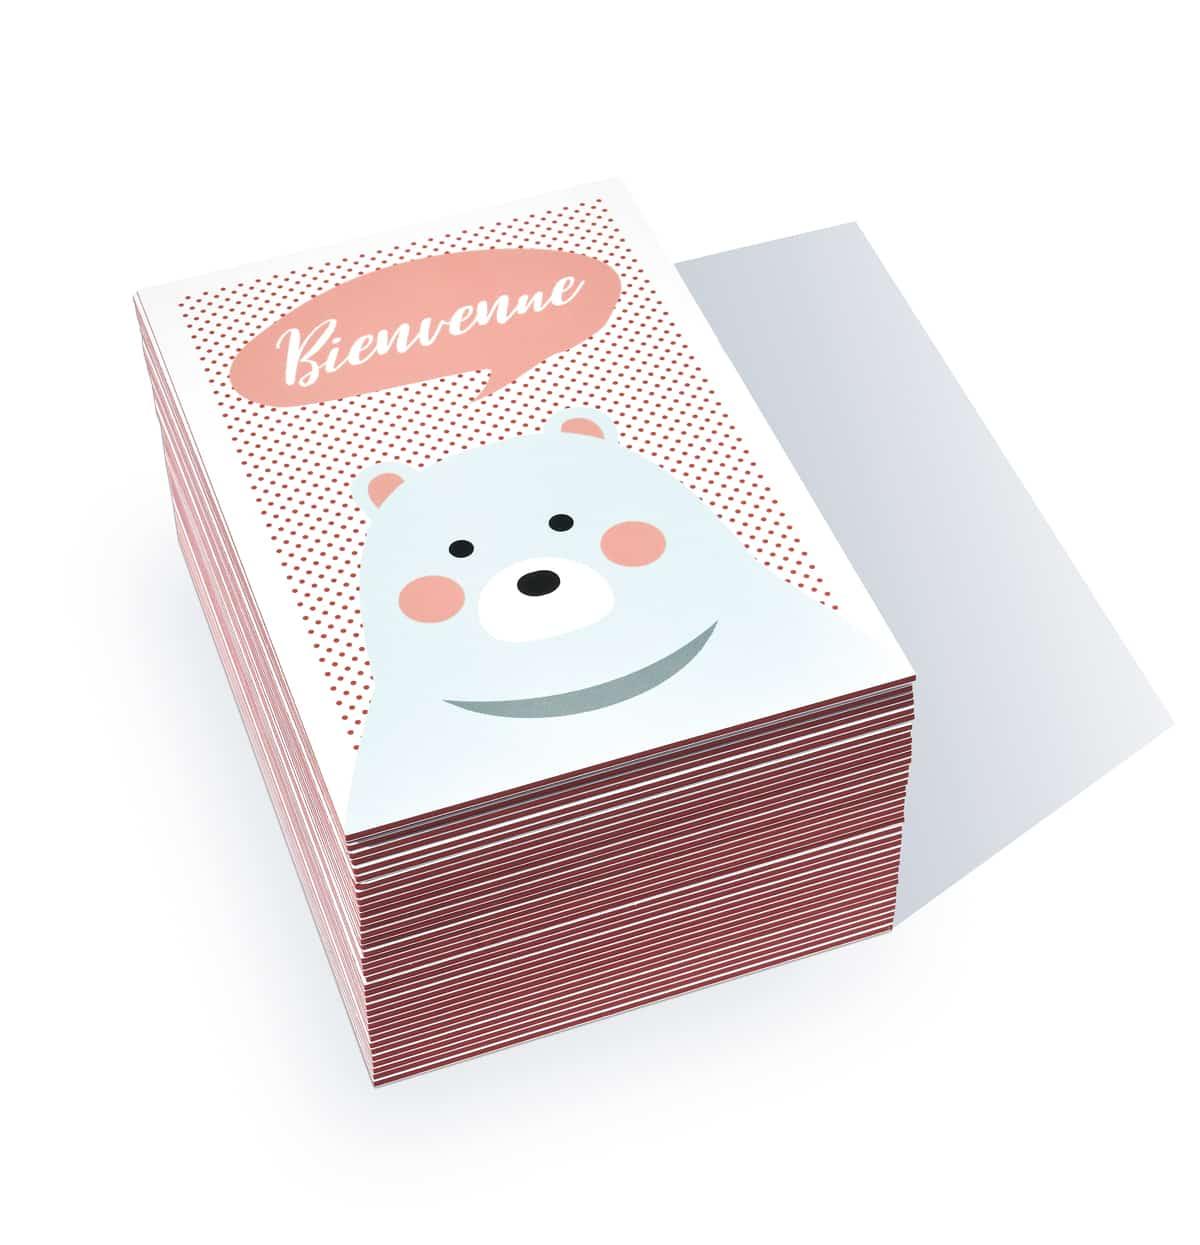 Carte postale naissance - Vivement Mercredi-2